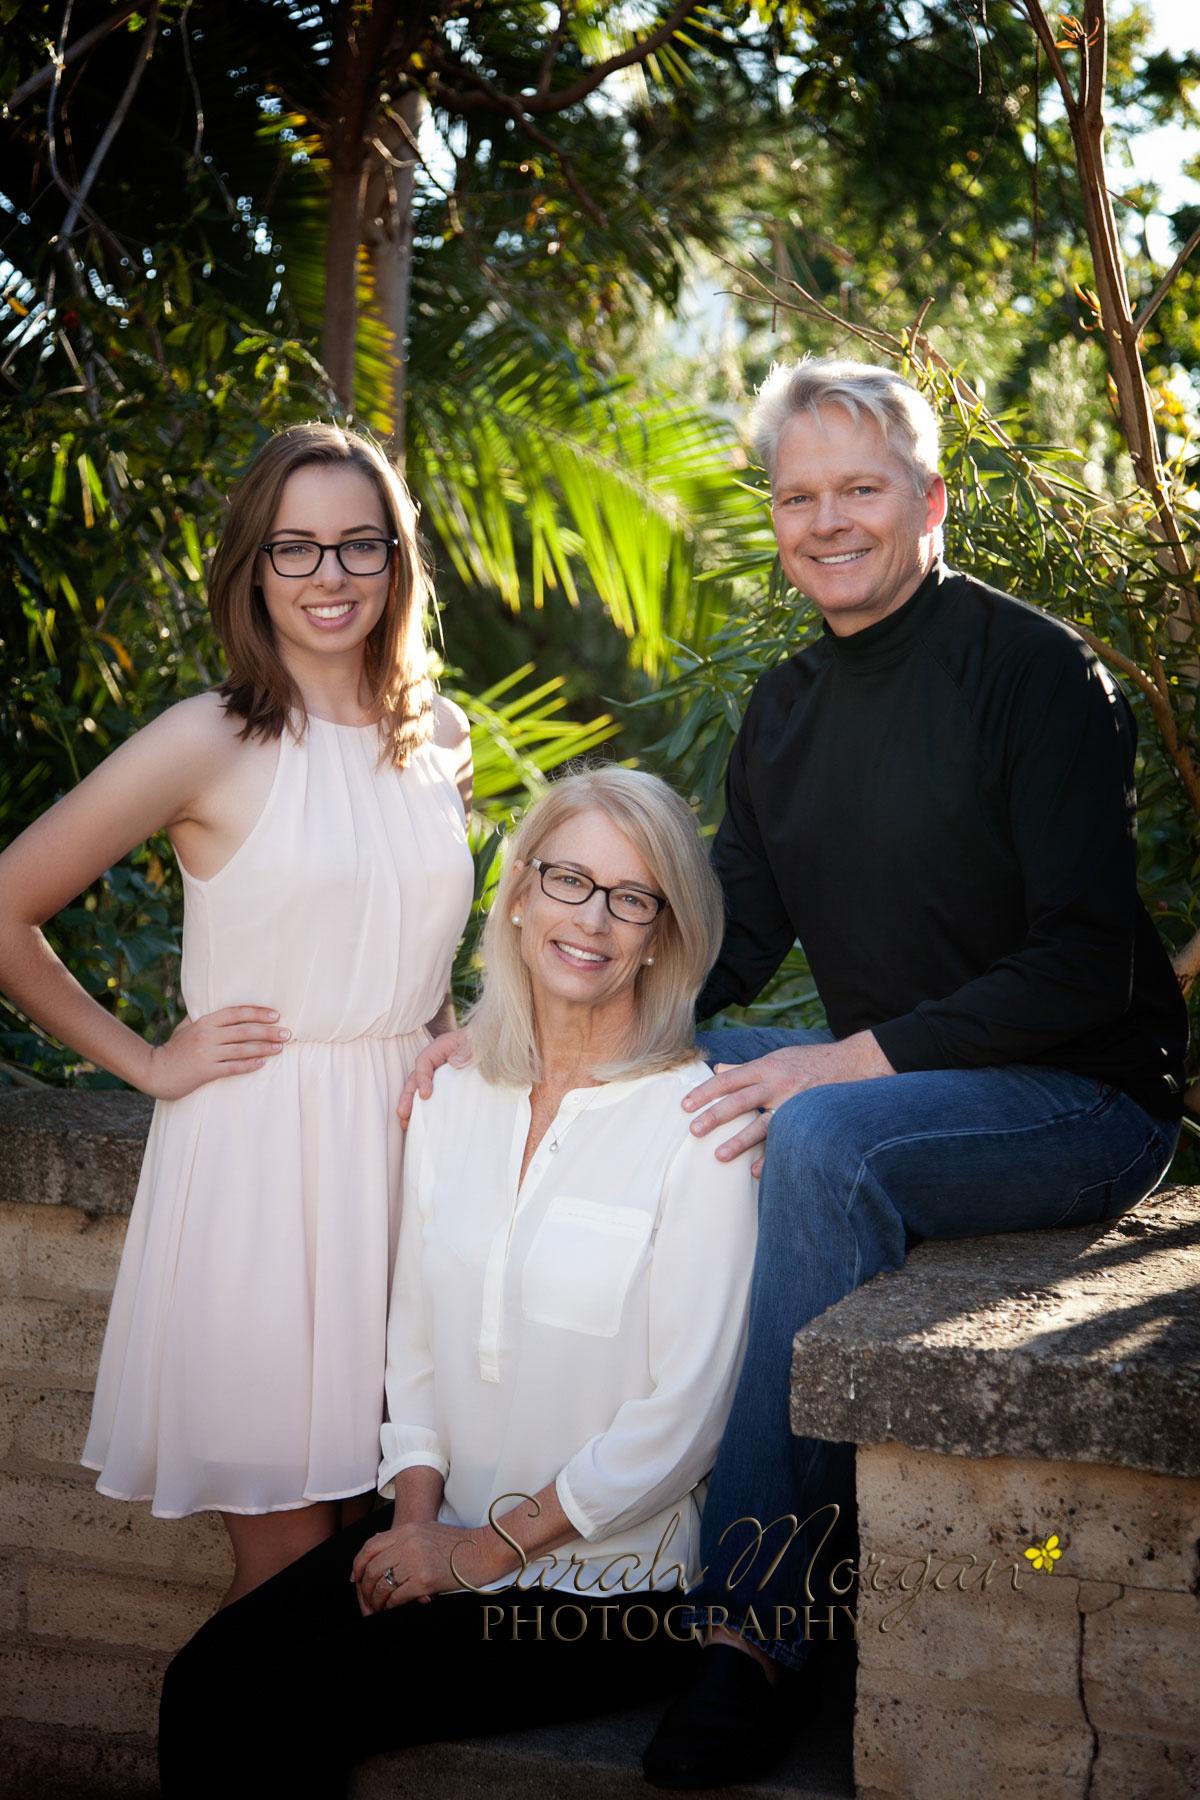 Family Portrait in San Diego's Balboa Park